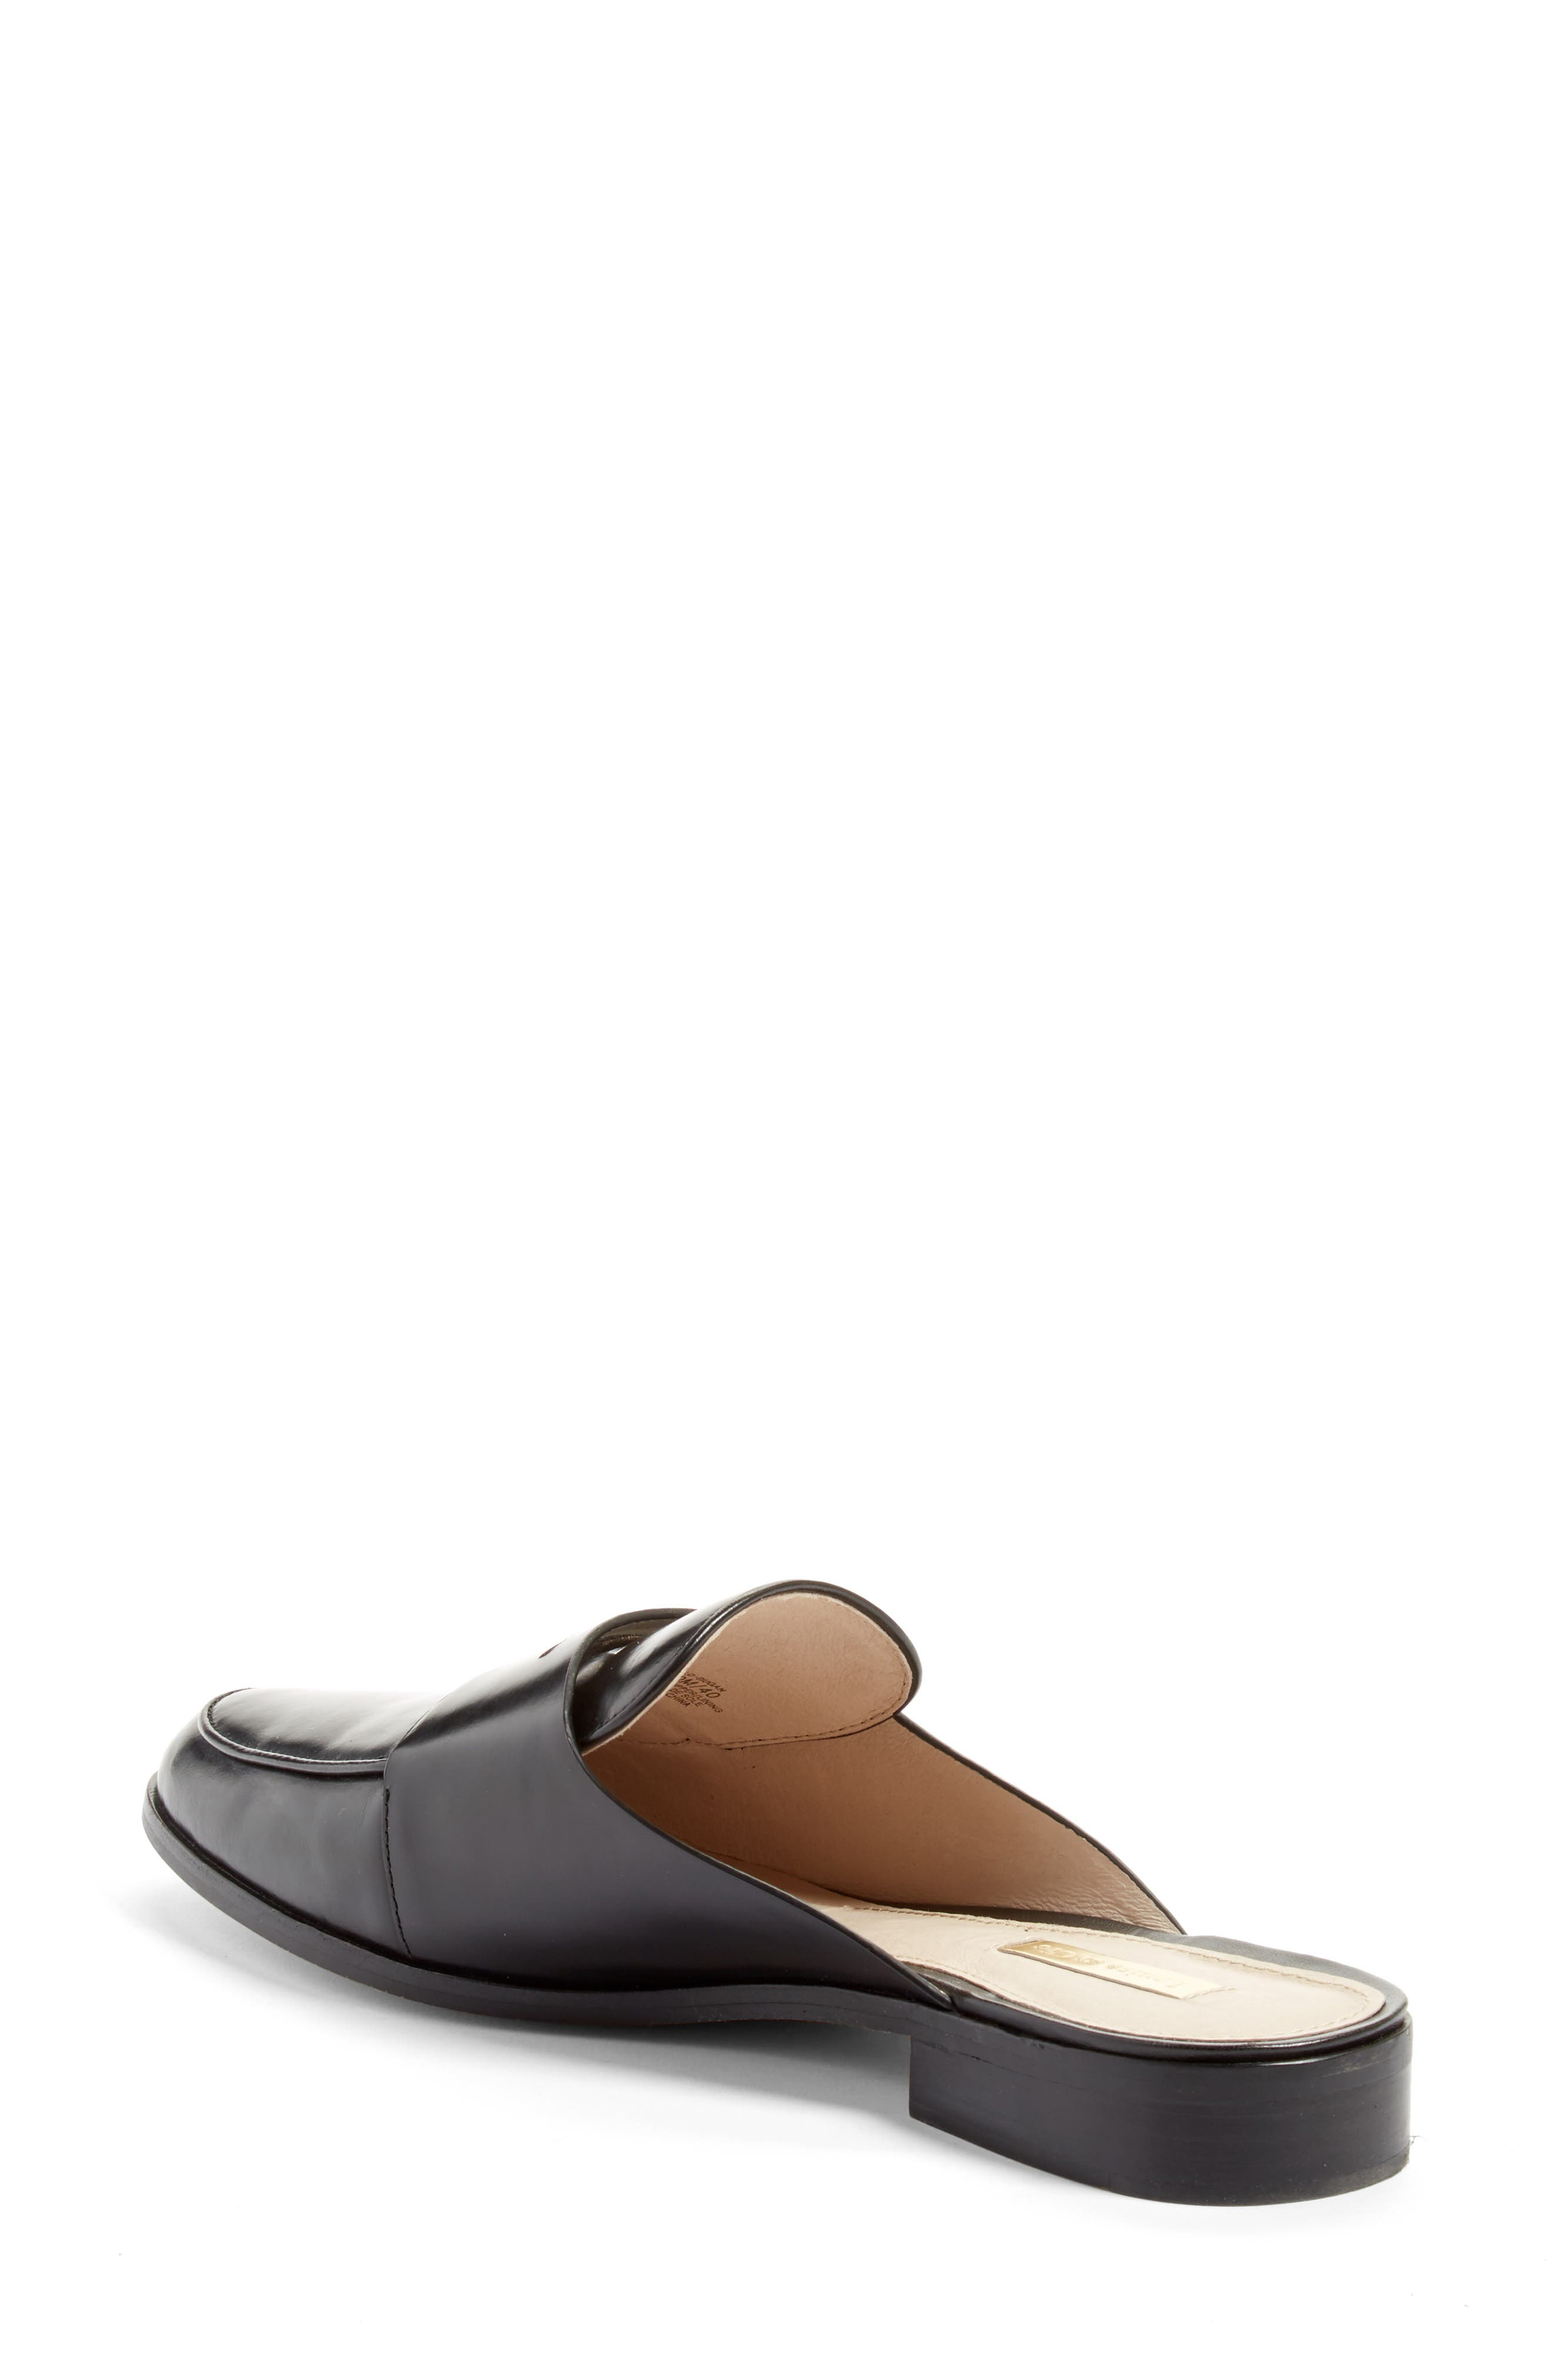 Dugan Flat Loafer Mule,                             Alternate thumbnail 6, color,